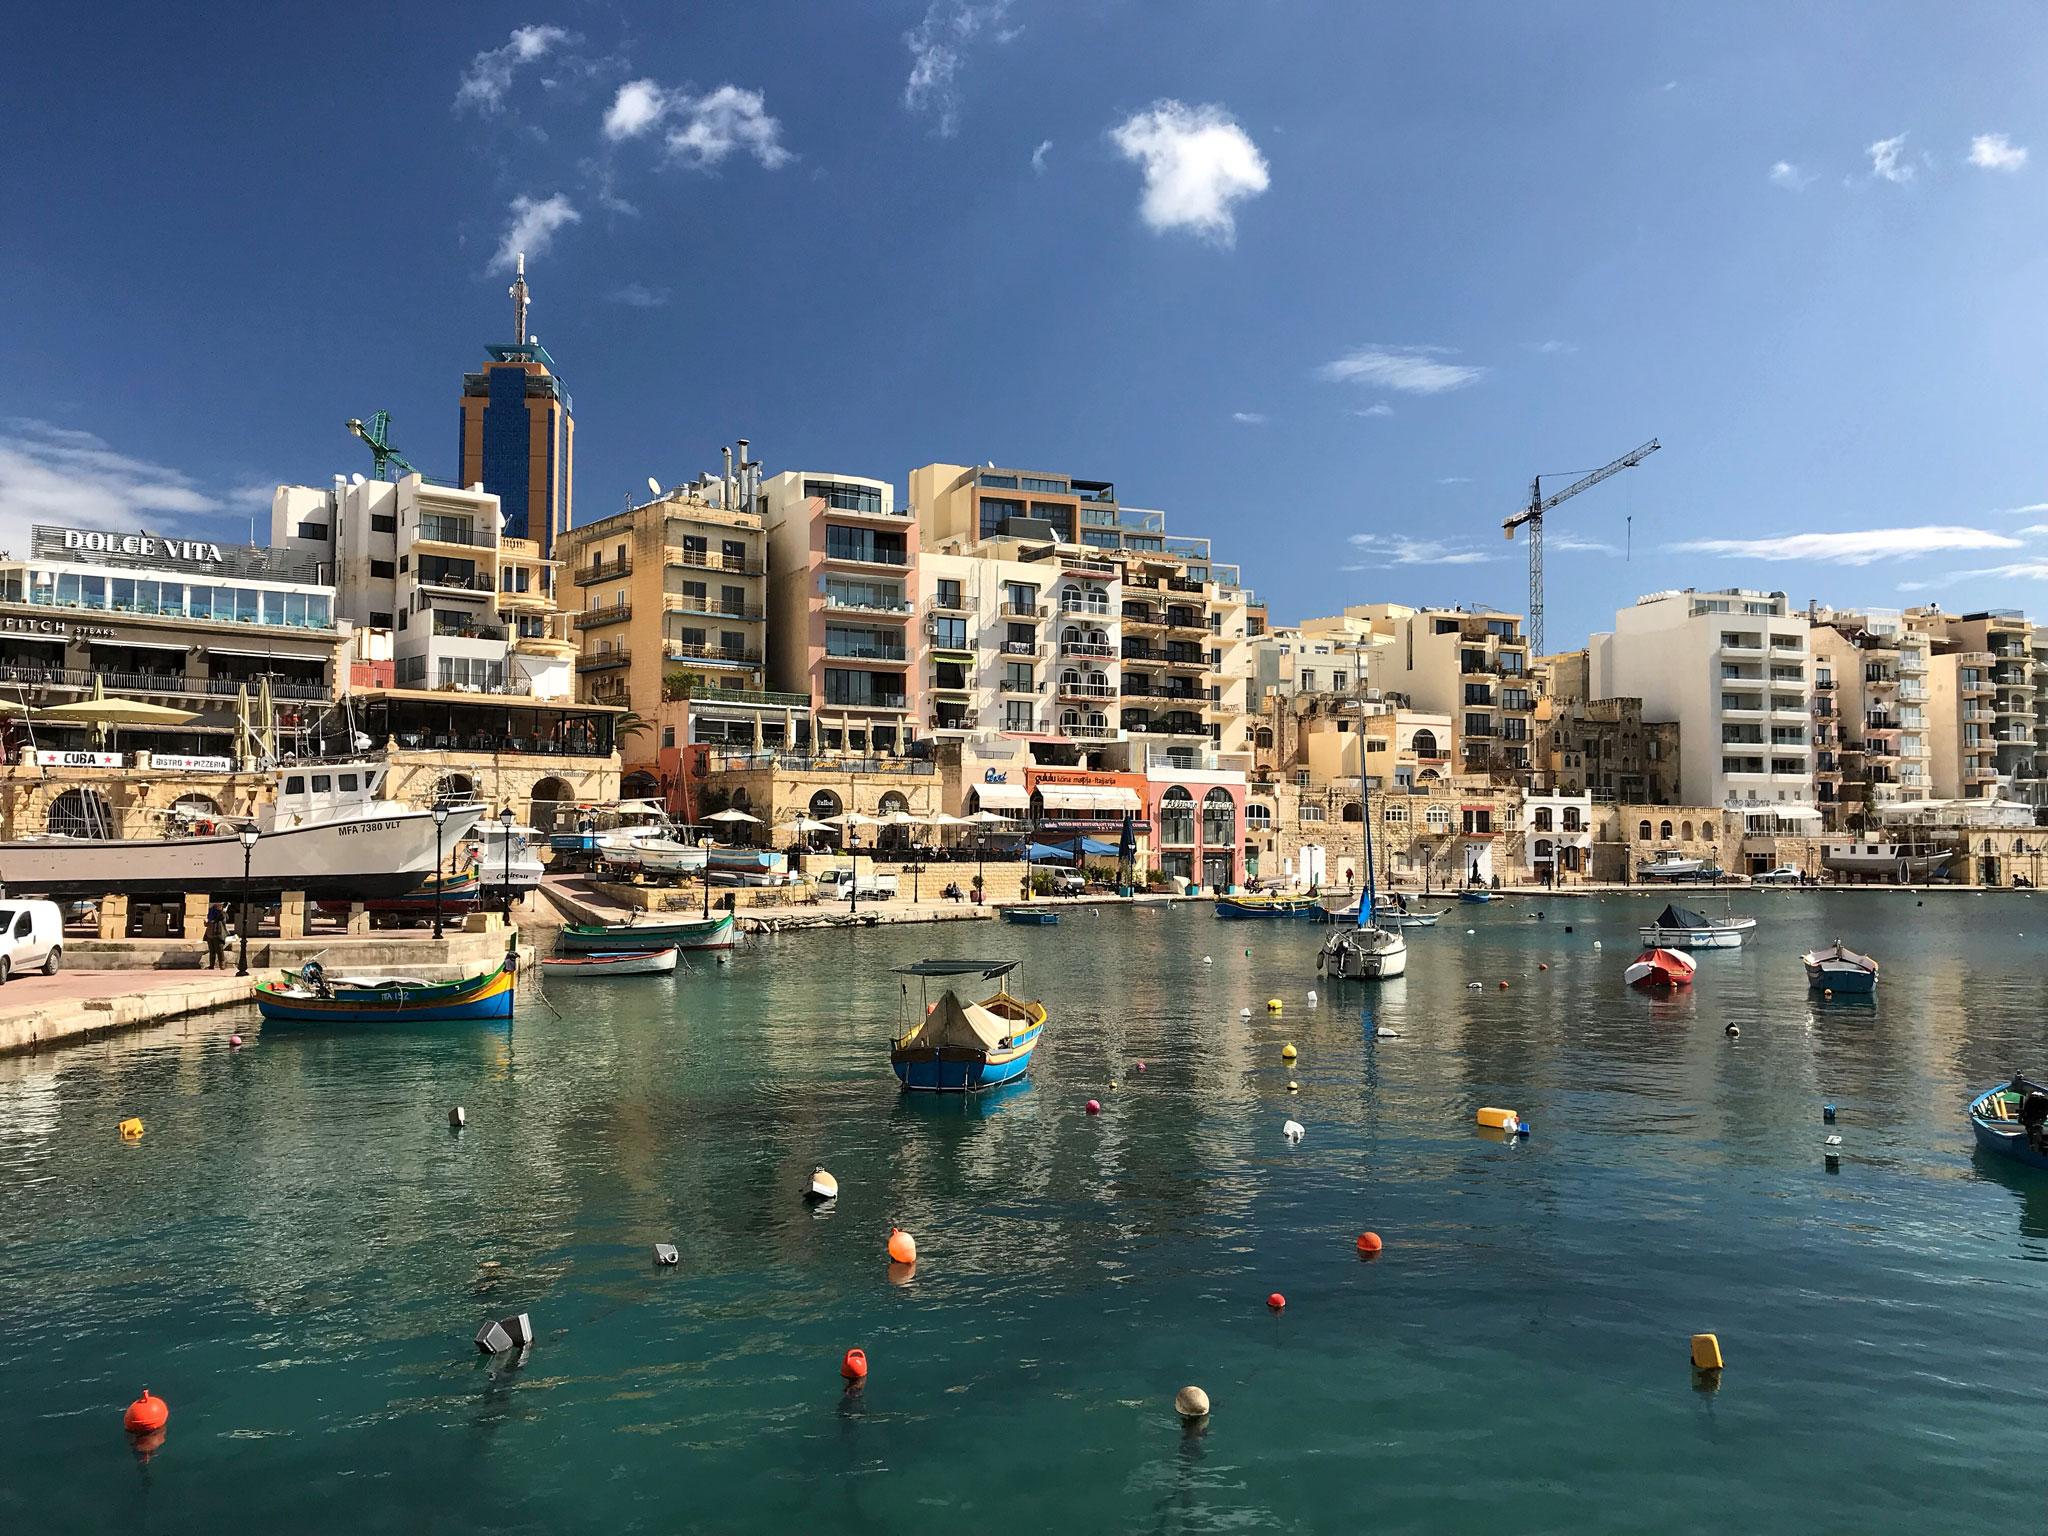 Spinola-Bay-St-Julians-Malta-mare-edifici-cielo